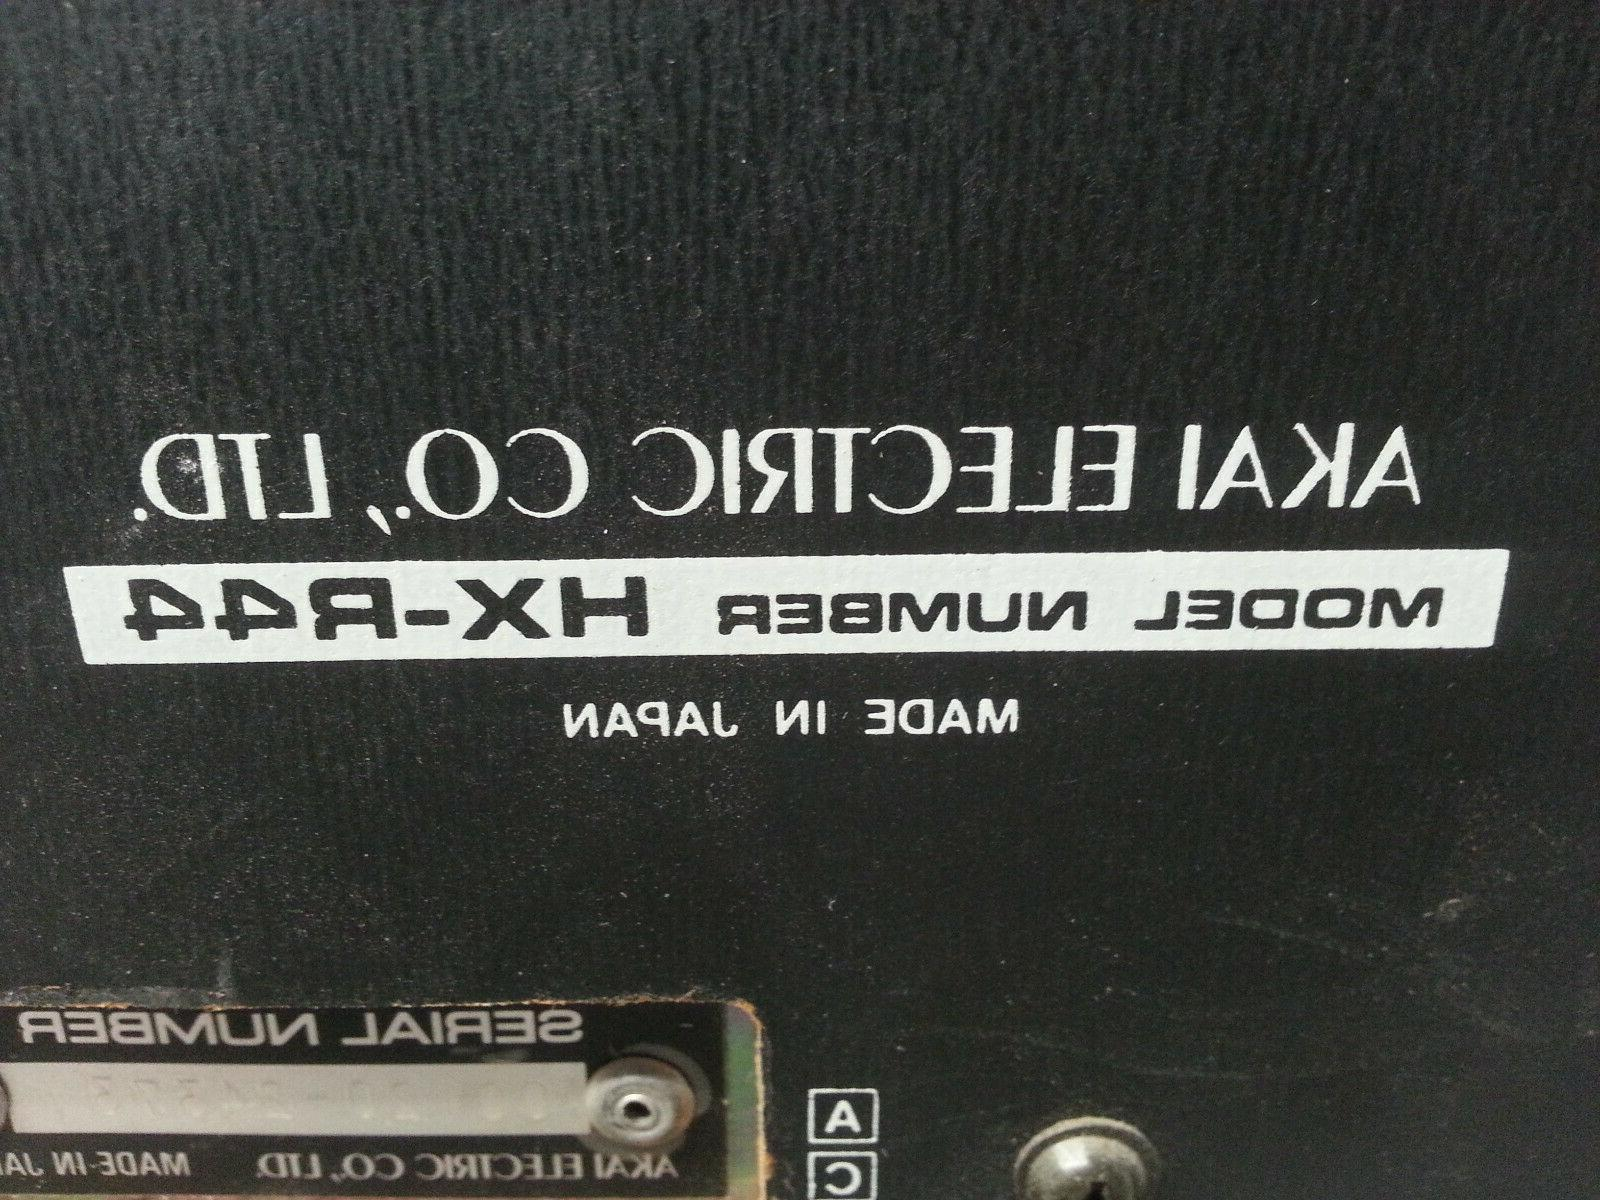 Akai HX-R44 Deck